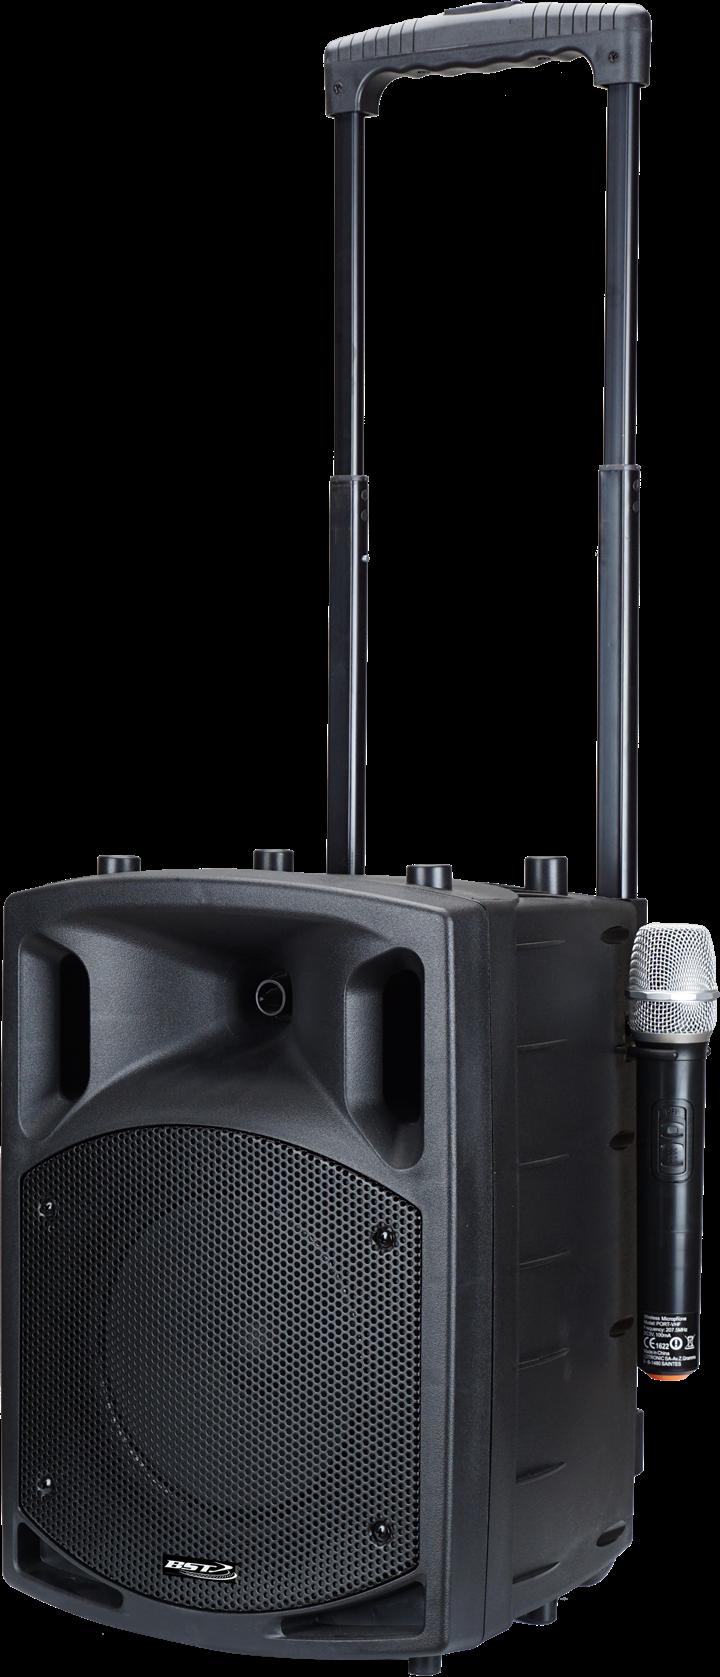 "BST 100W transportabel 8"" højttaler med USB, MP3, BT & mikrofoner"